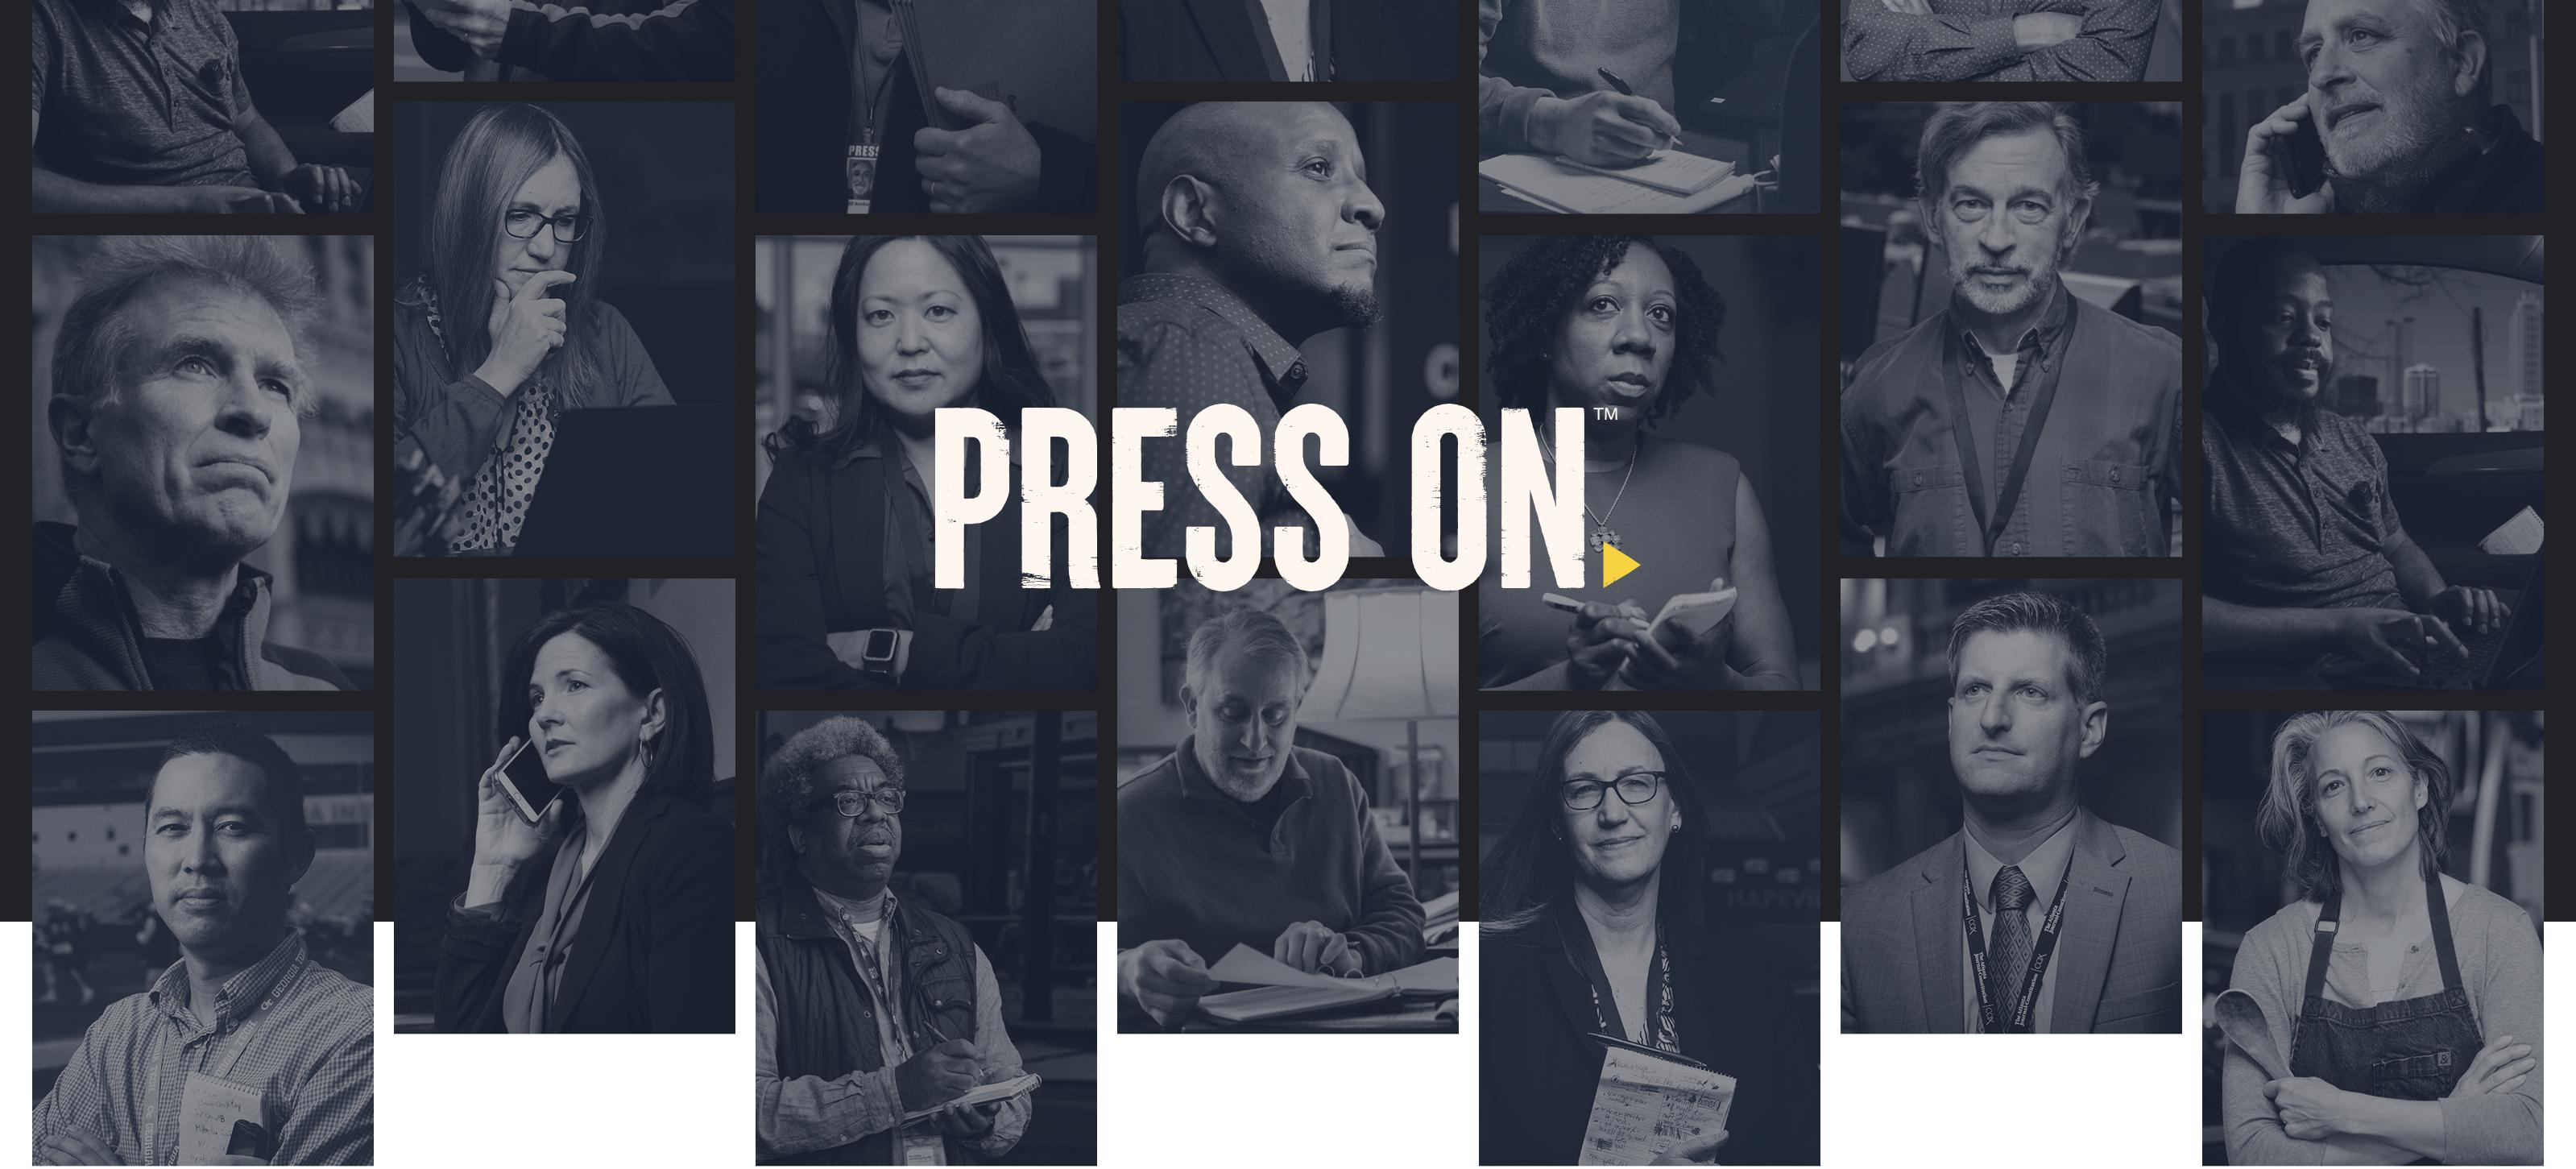 Press On.